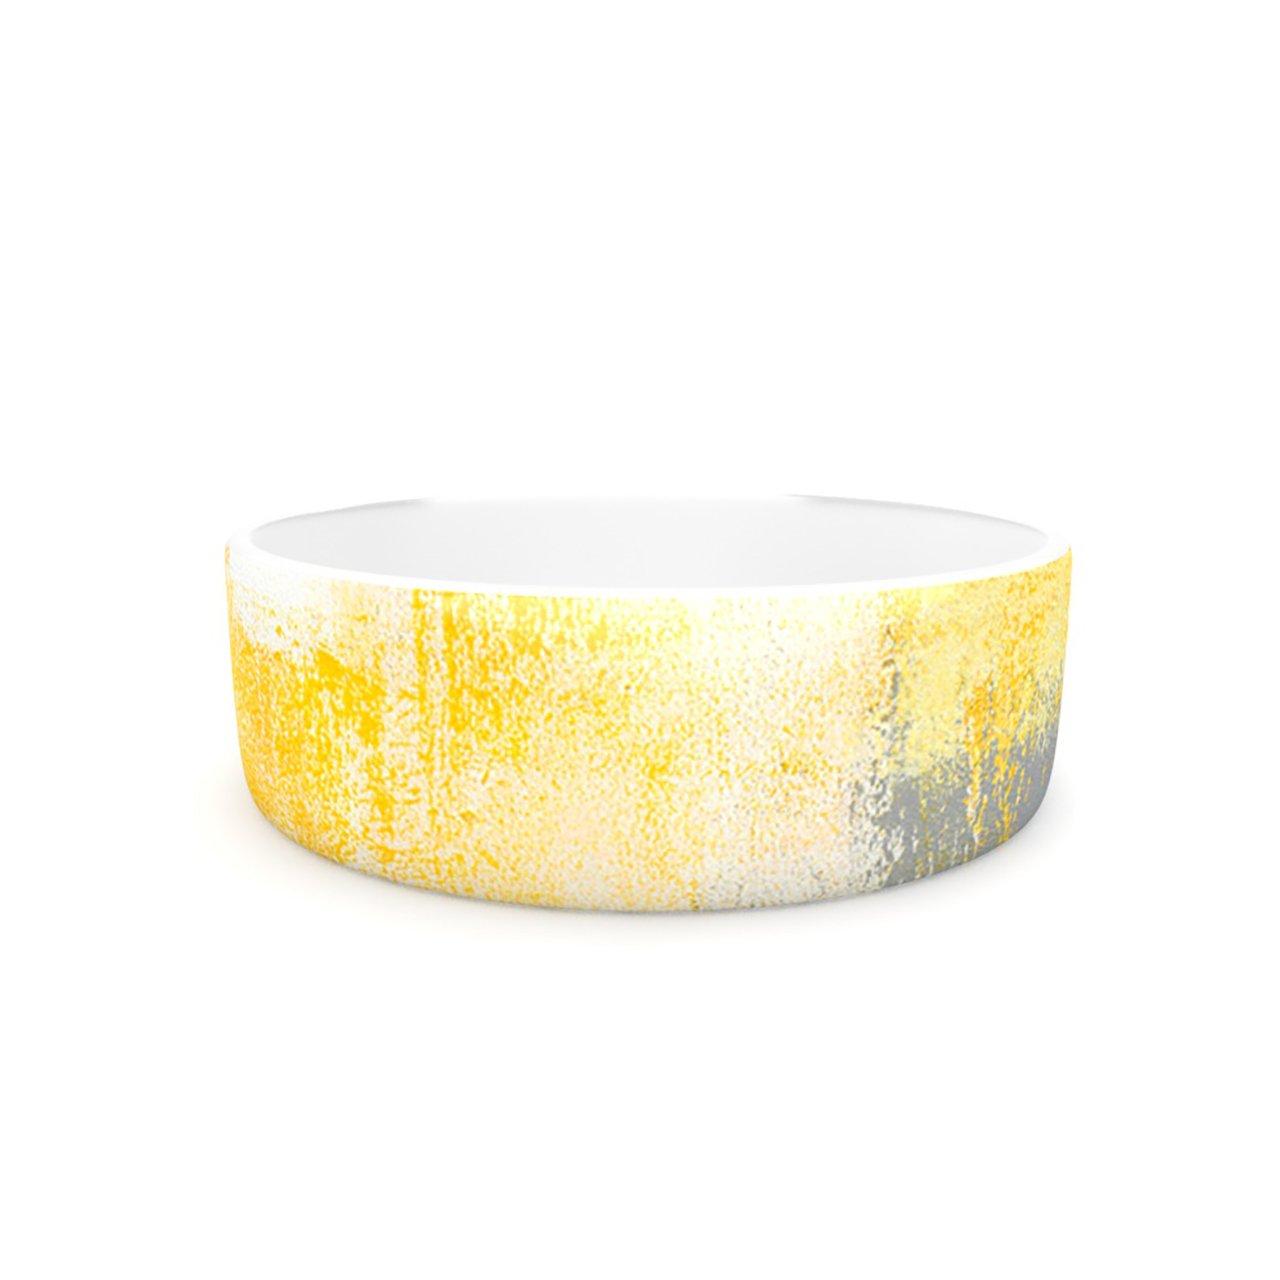 Kess InHouse CarolLynn Tice Breakfast  Pet Bowl, 7-Inch, Grey gold